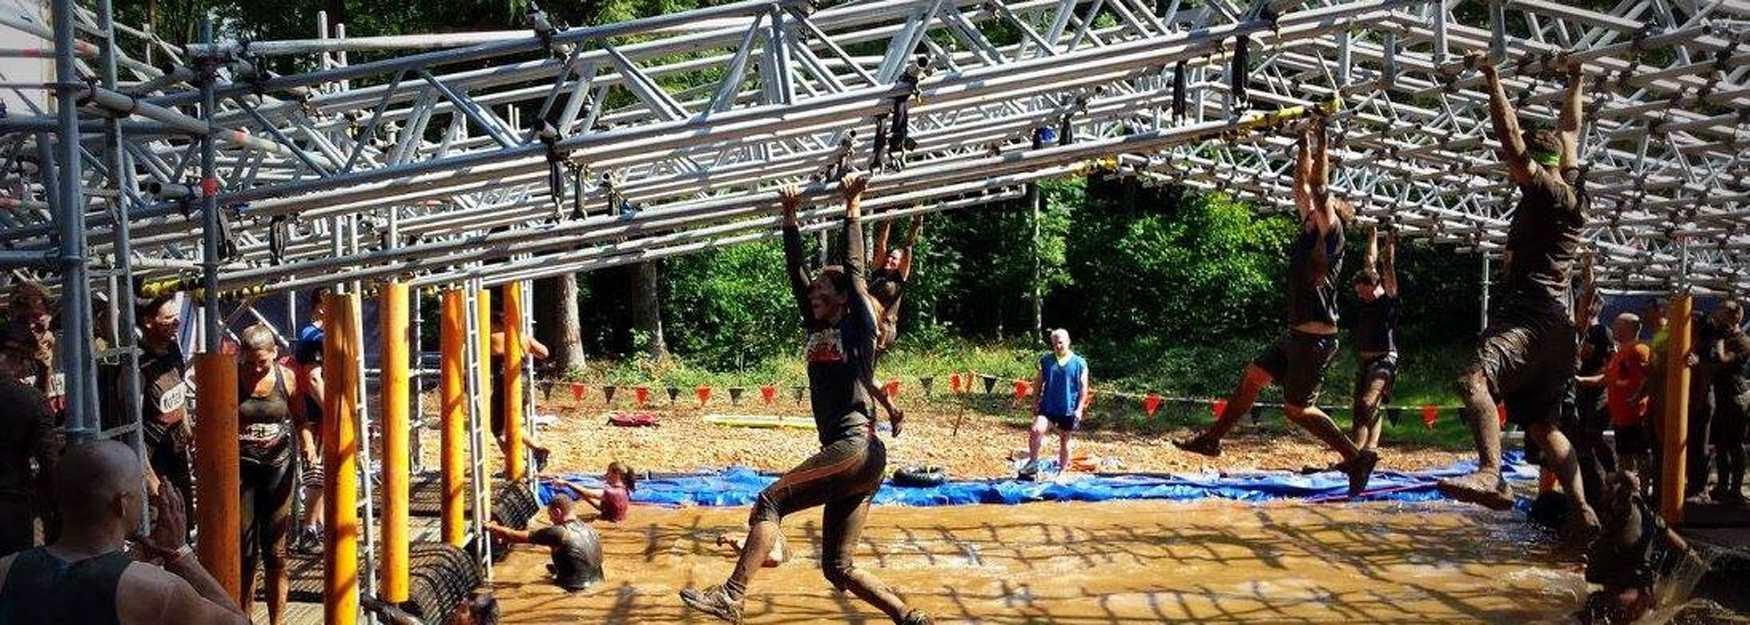 Outdoor Activities - Tough Mudder